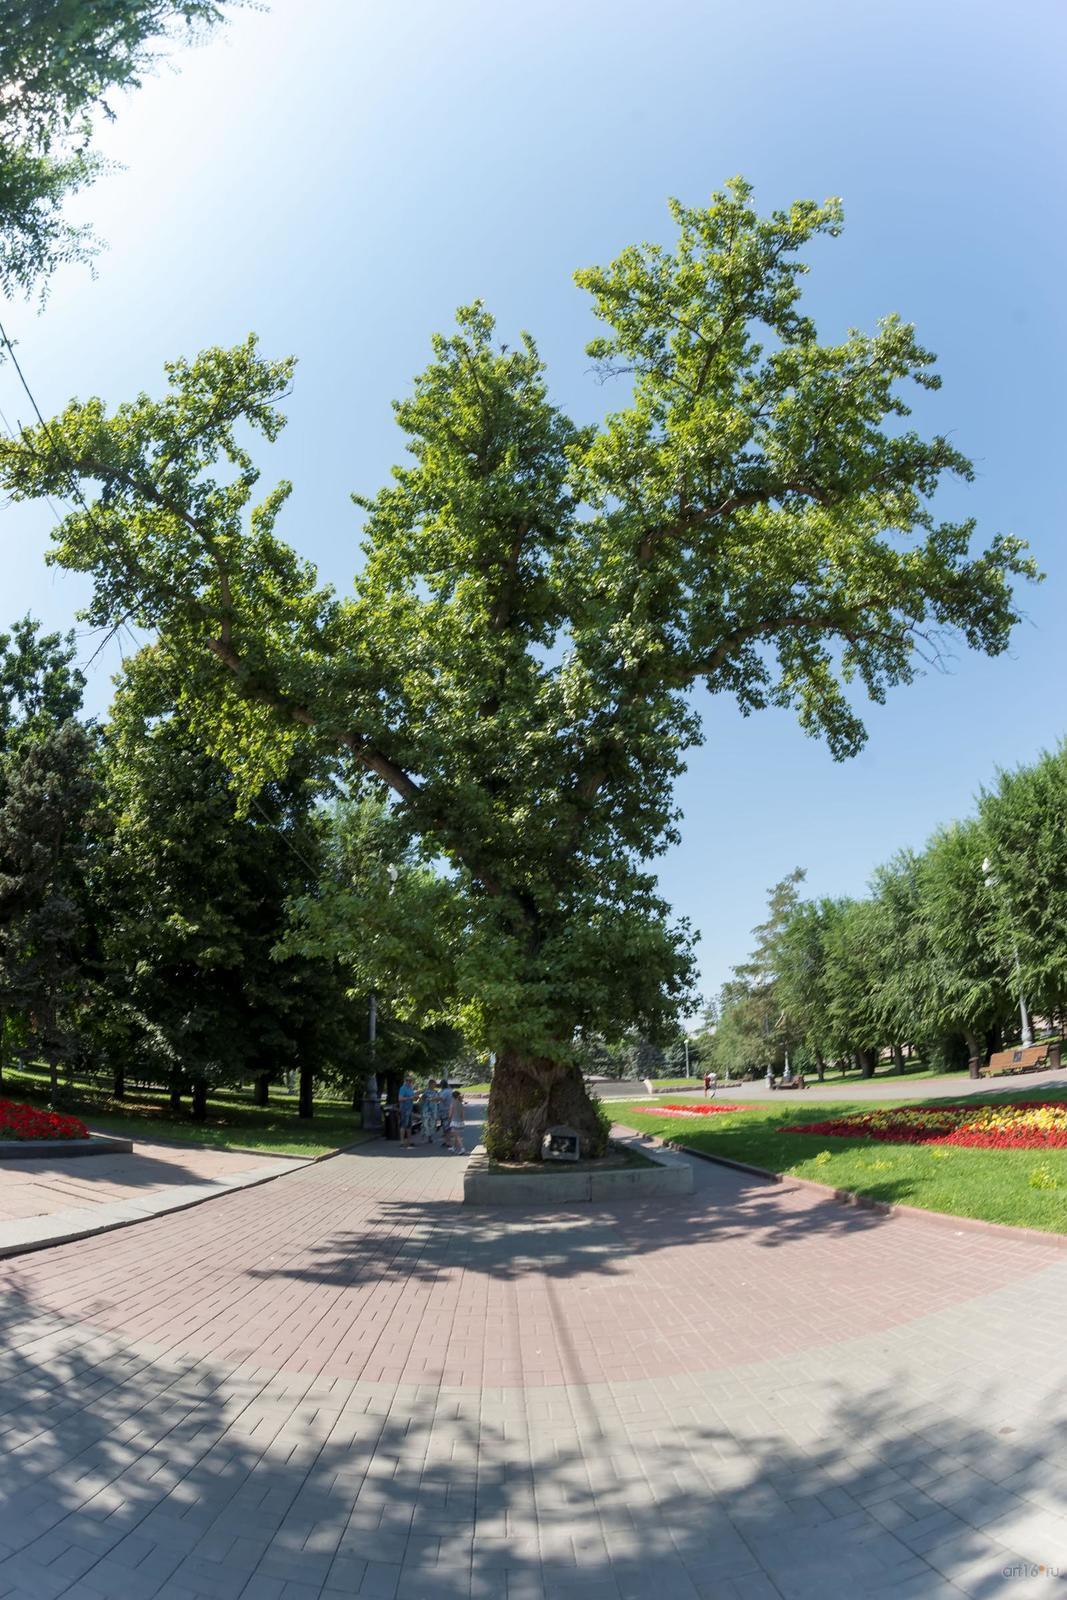 Фото №858883. То́поль на пло́щади Па́вших борцо́в — исторический и природный памятник Волгограда